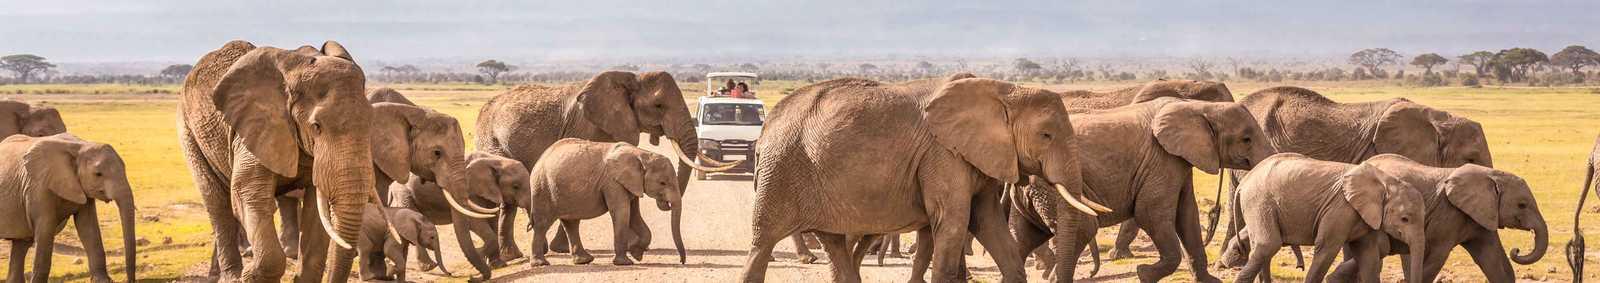 Tanzania Elephant Safari